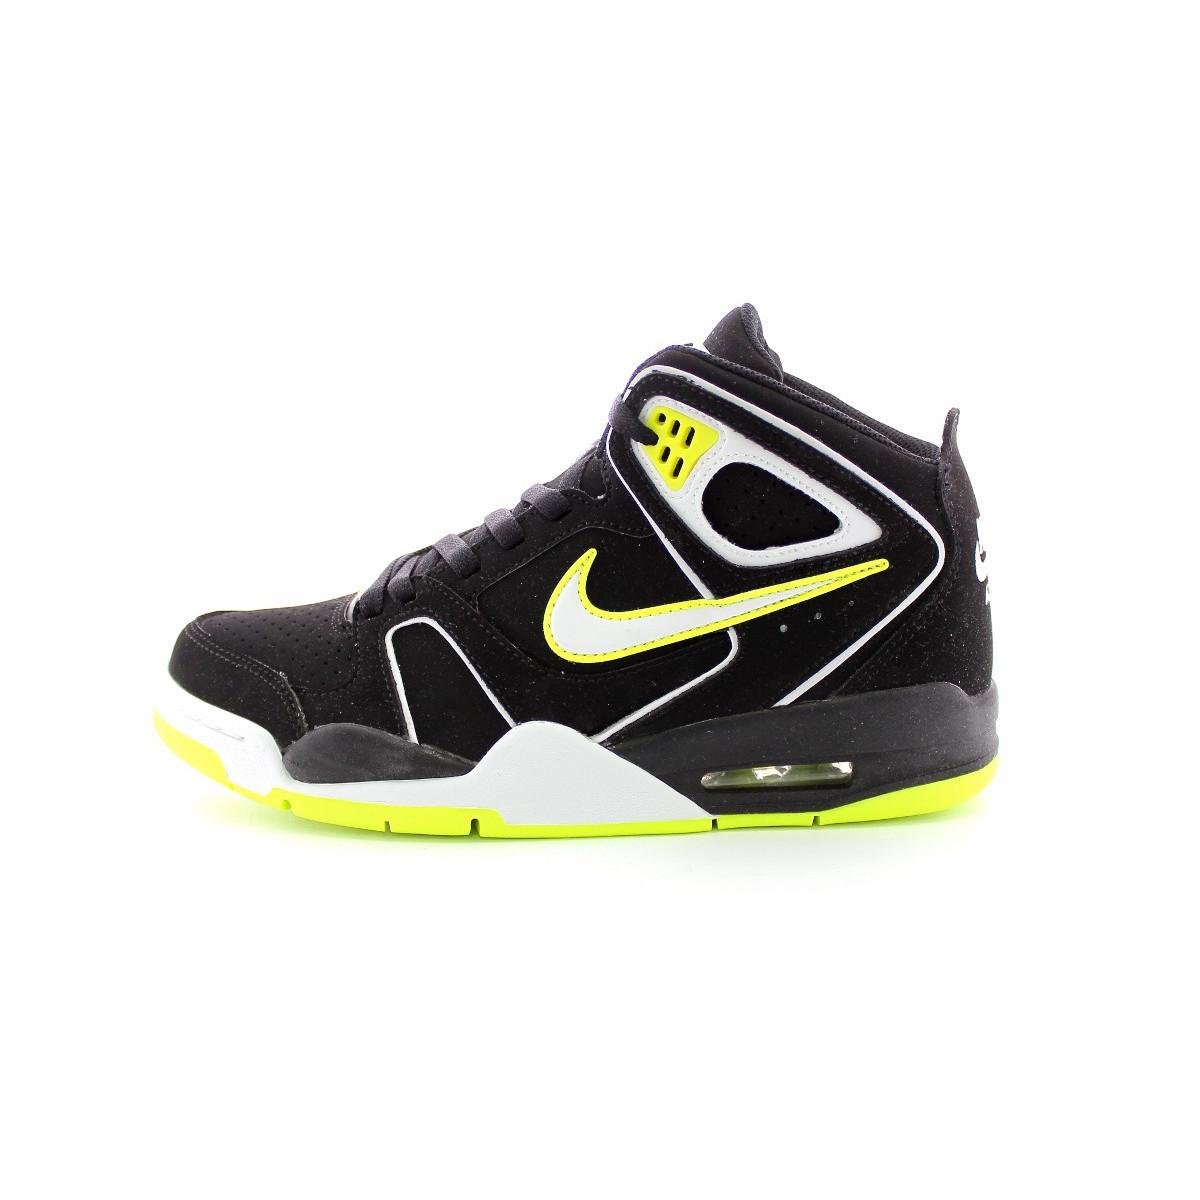 Ref Downtownstock Basket Flight 013 com Air Nike Falcon 397204 UCUqwn0I1x